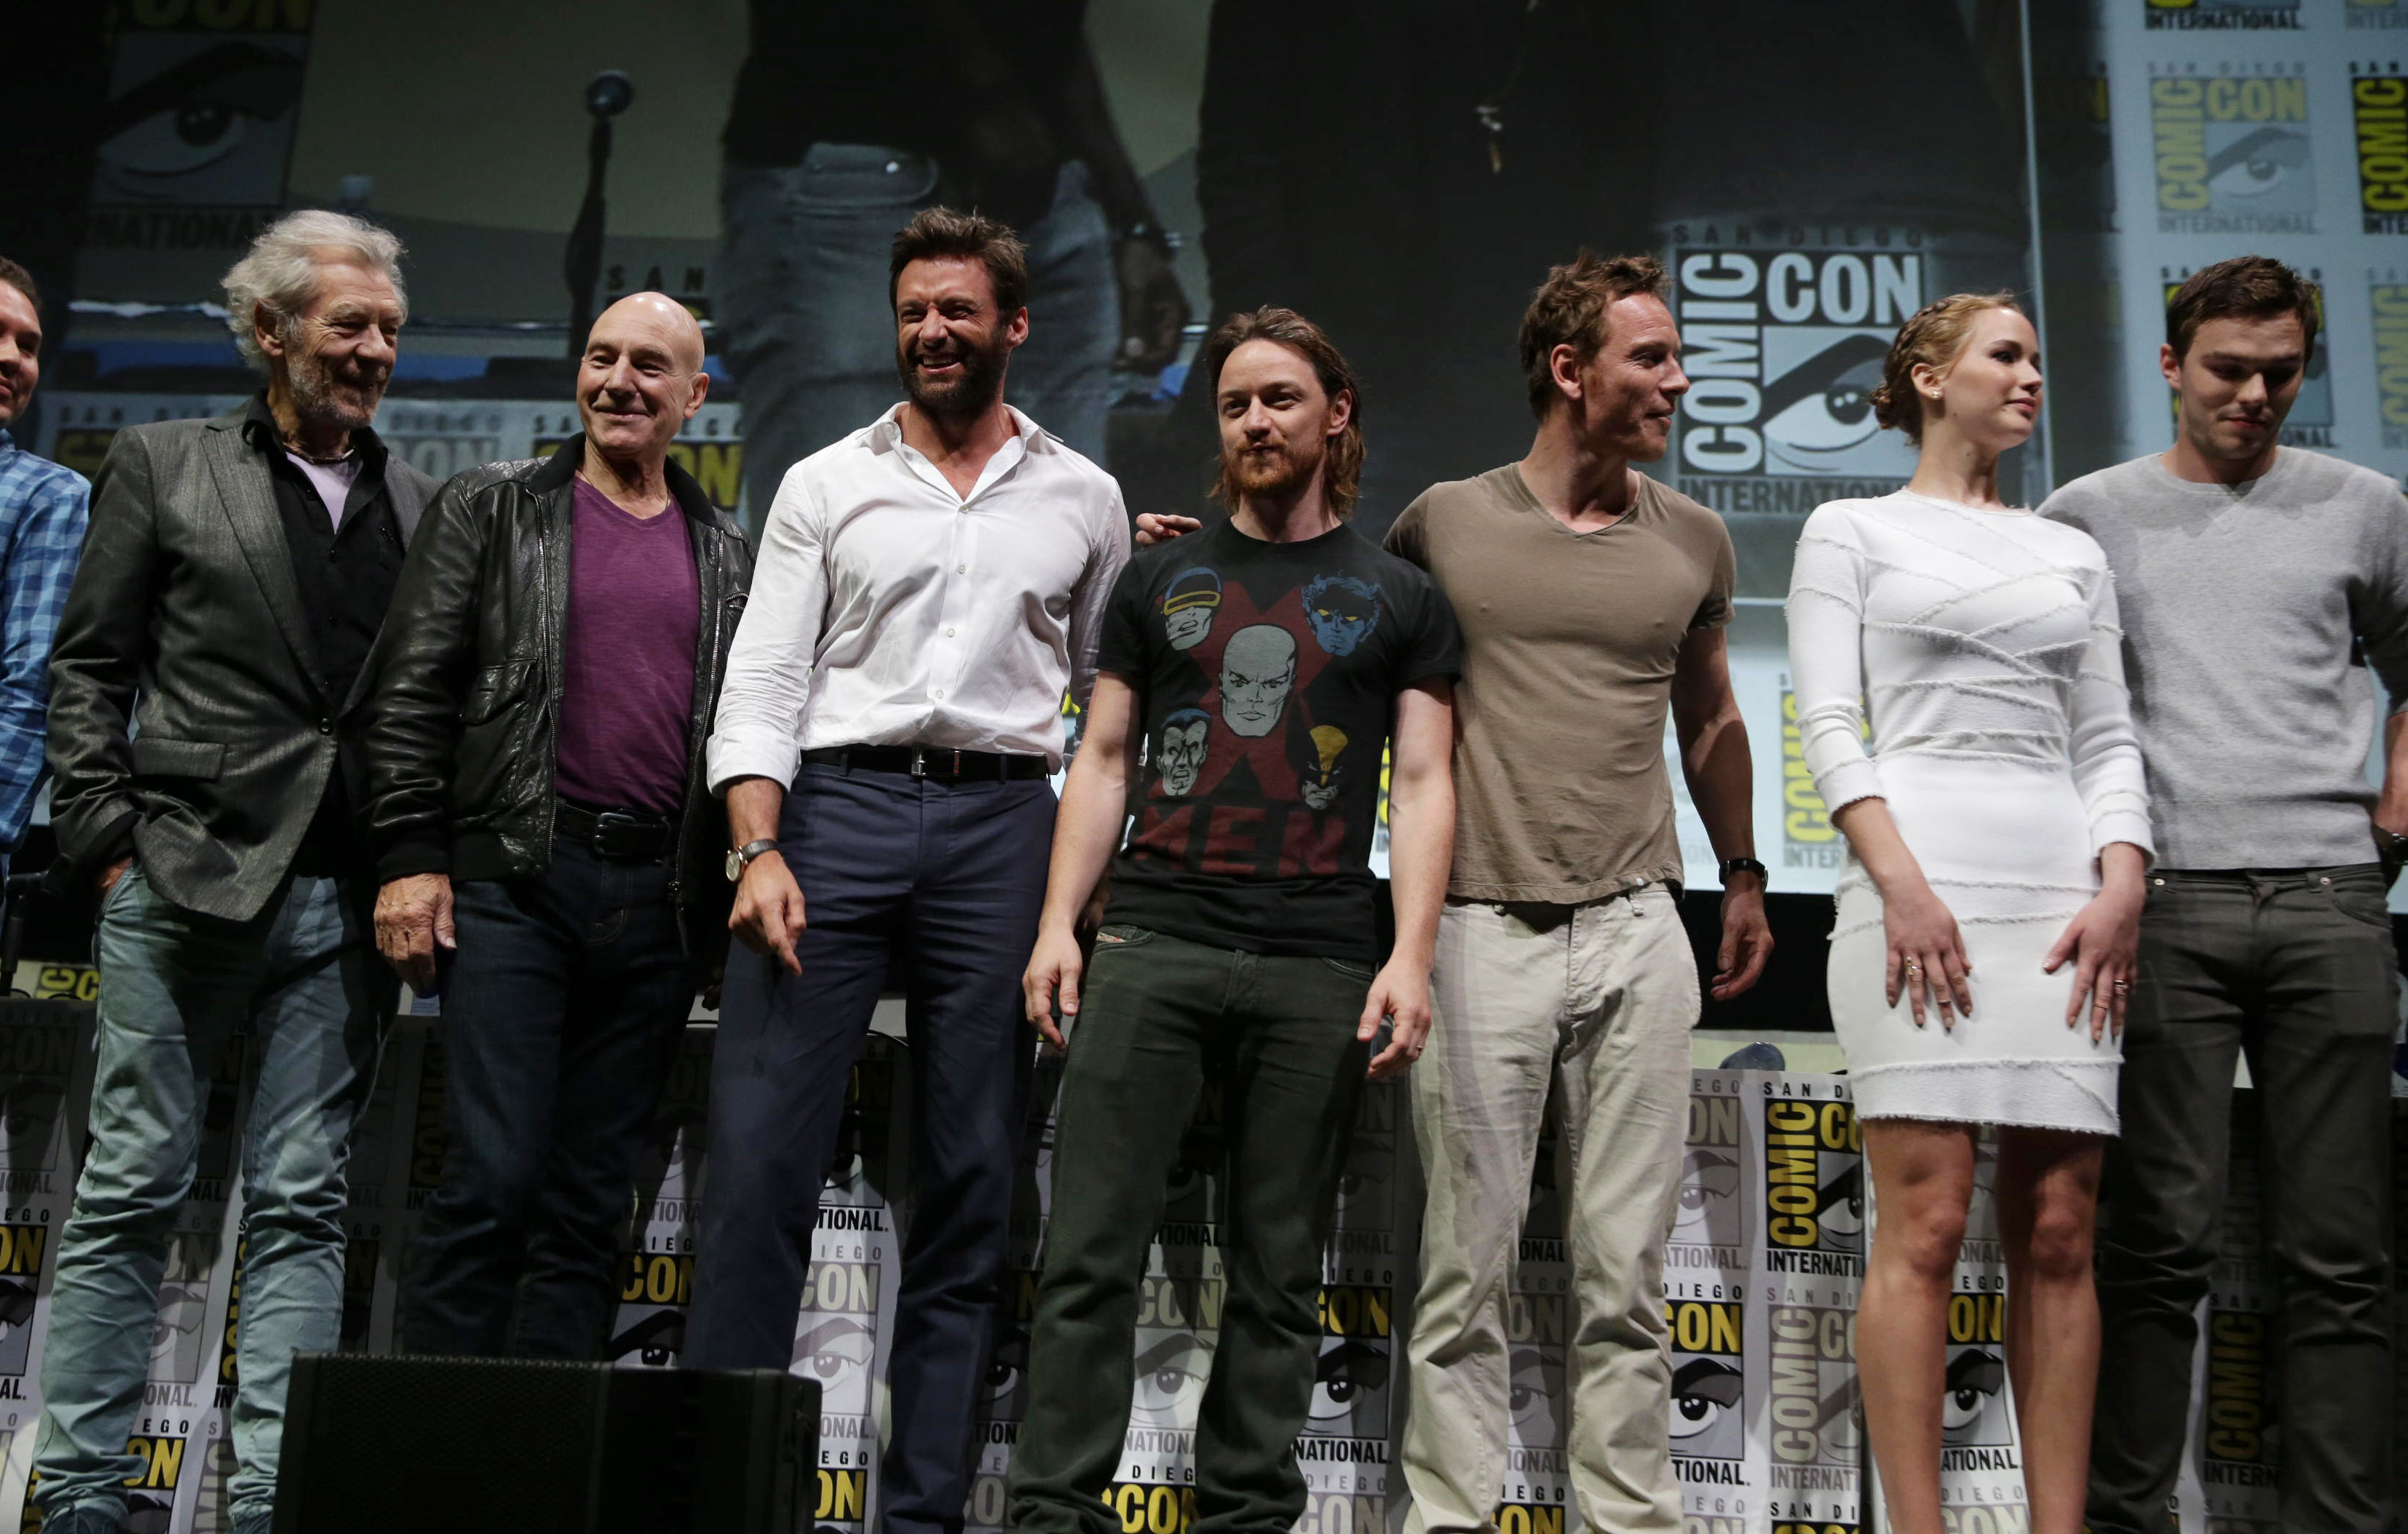 Ian McKellen, Patrick Stewart, Hugh Jackman, James McAvoy, Michael Fassbender, Jennifer Lawrence, Nicholas Hoult